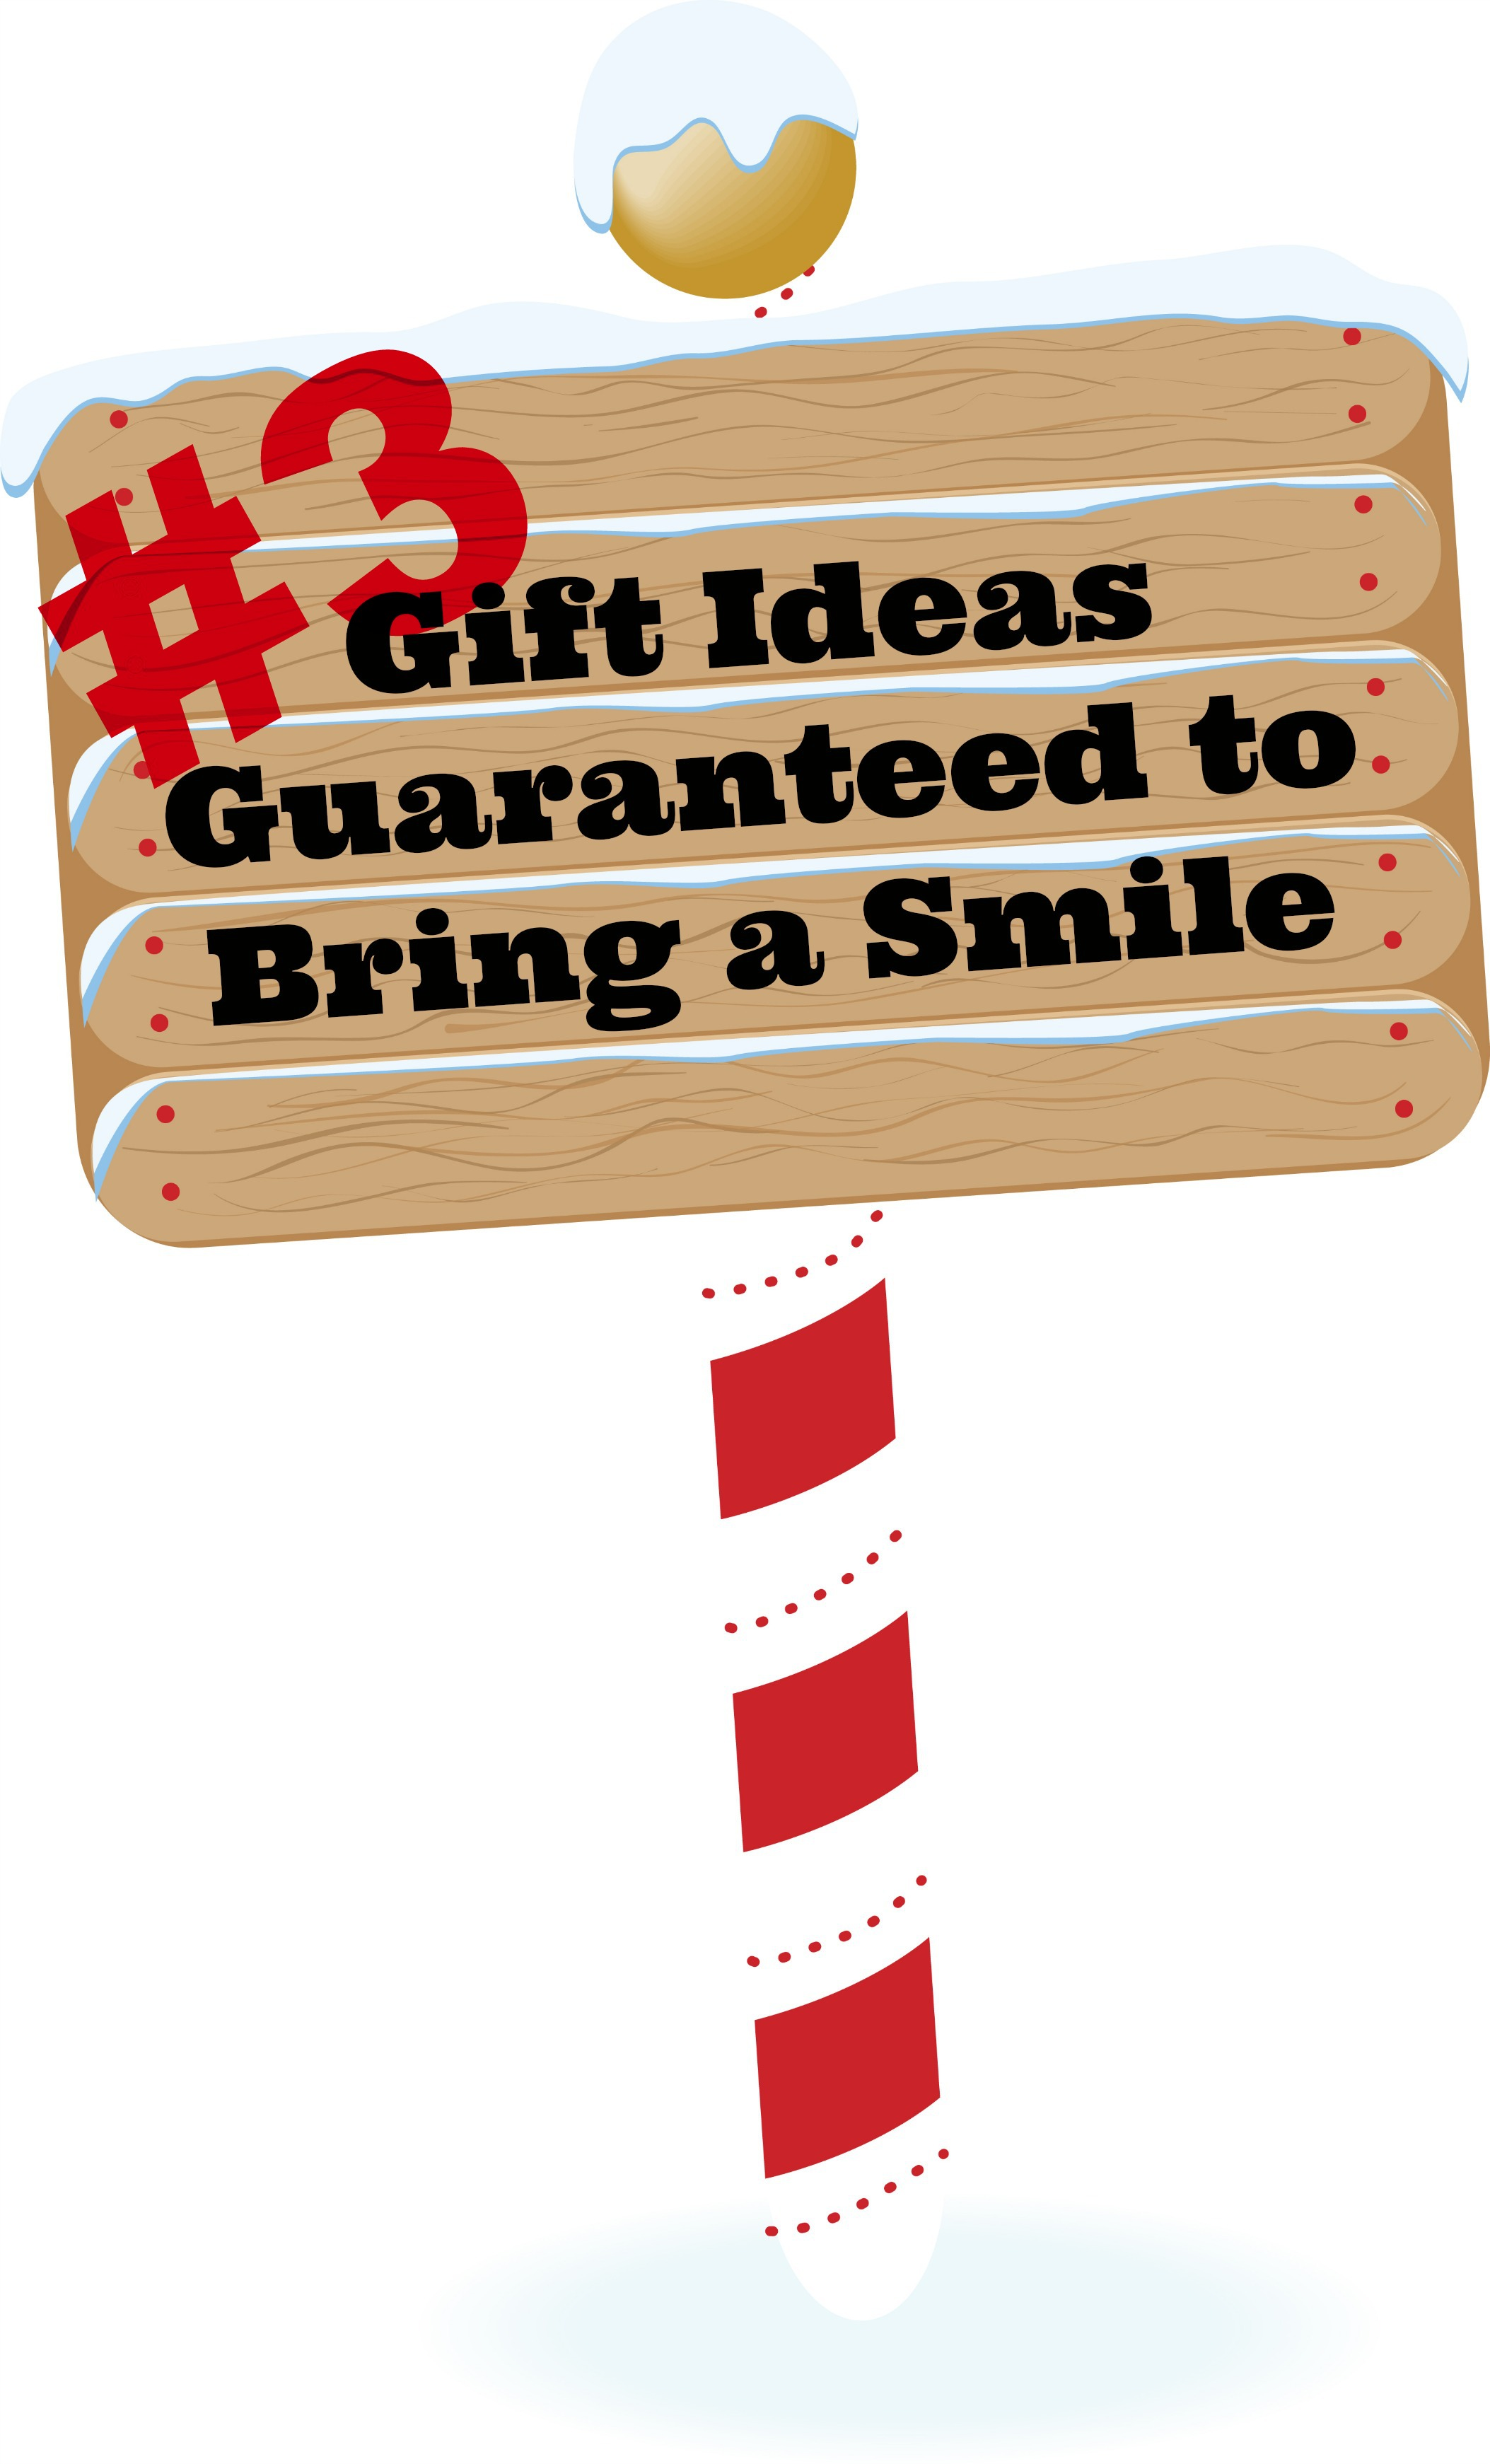 Gift Idea #3